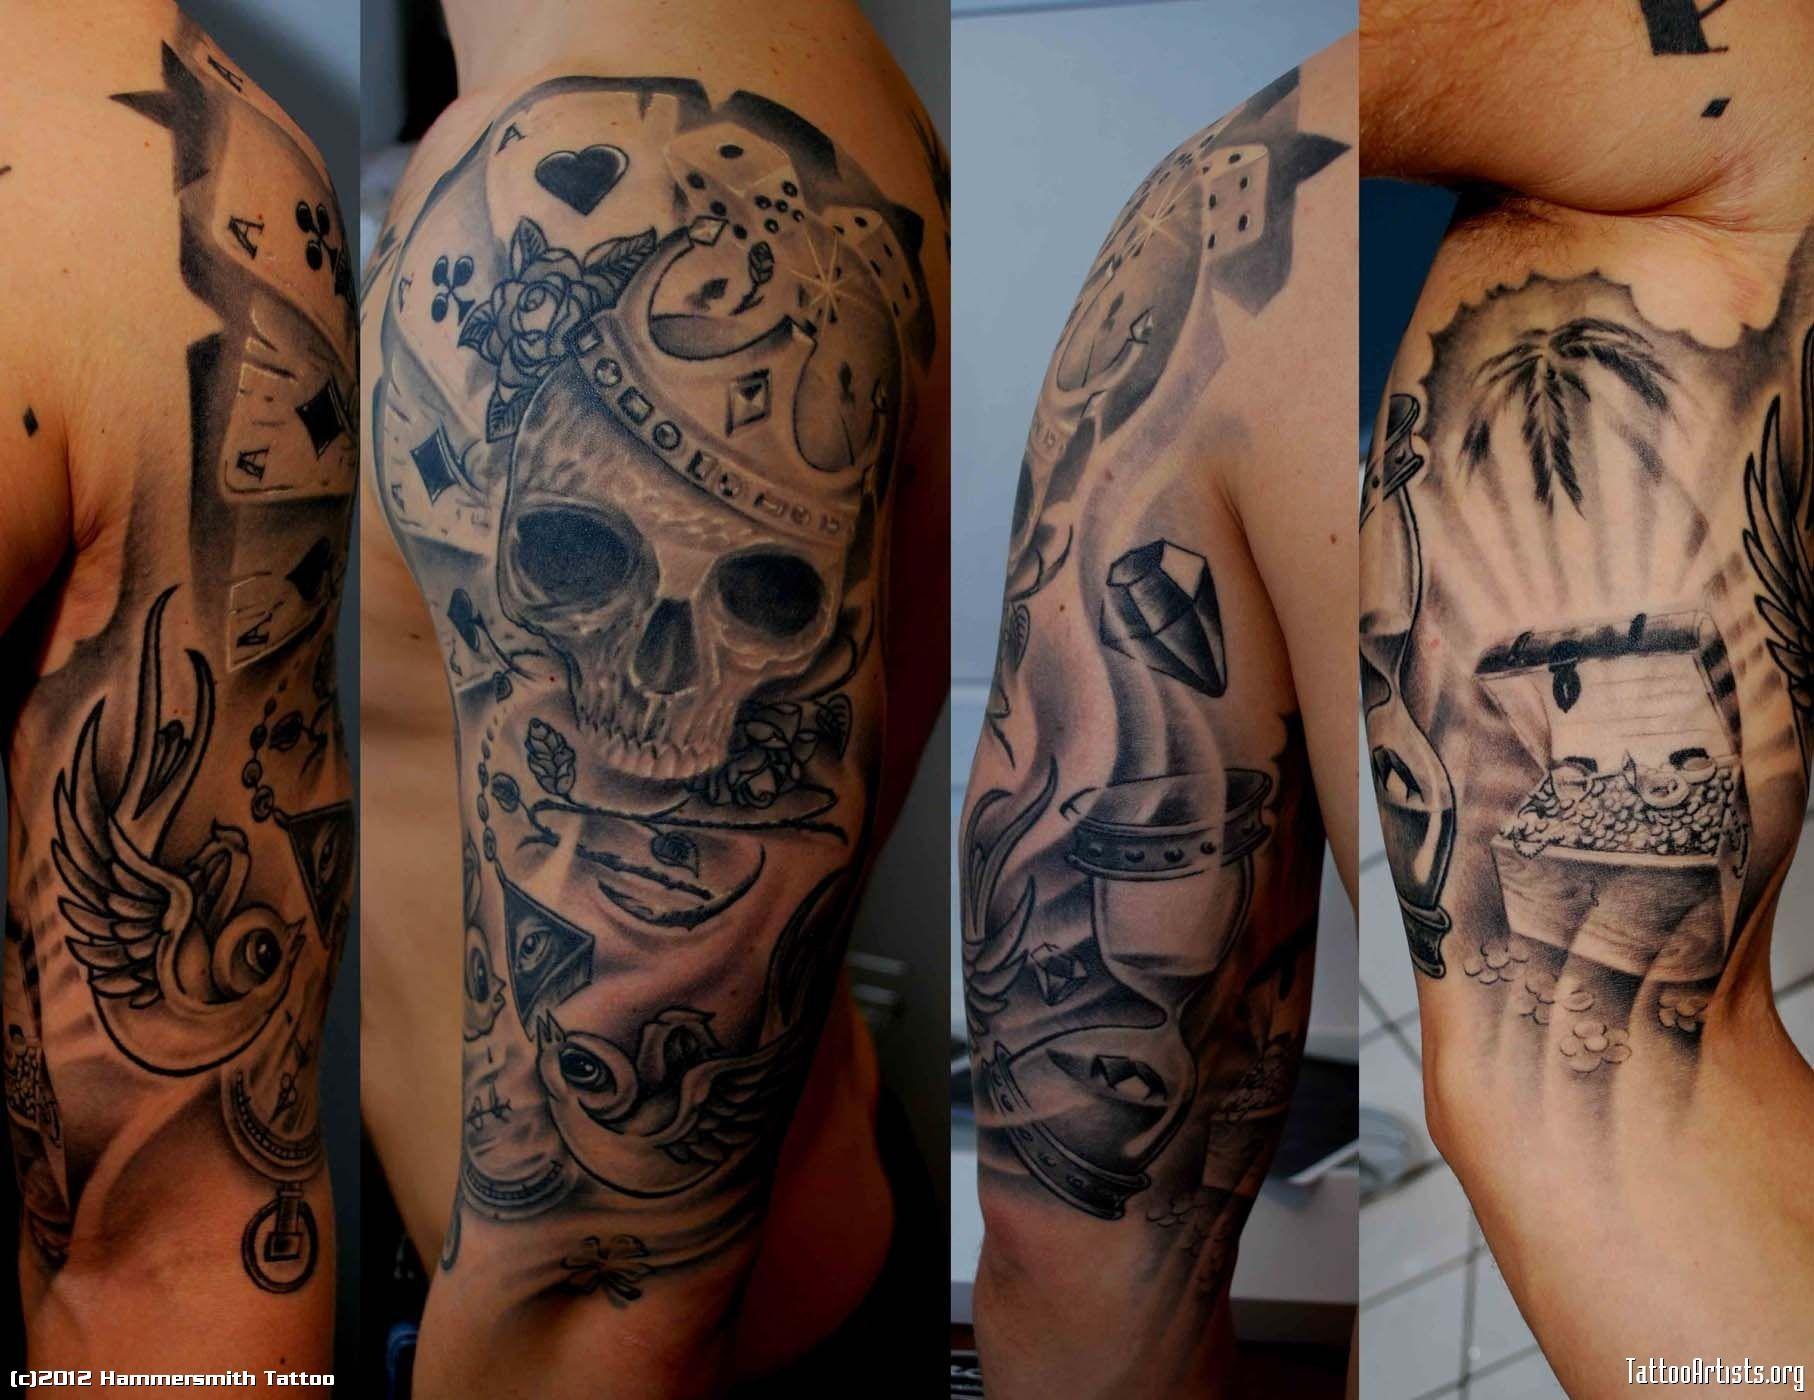 Black Grey Sleeve Tattoo Ideas: Black And Grey Koi Fish Sleevefull Tattoo Sleeves